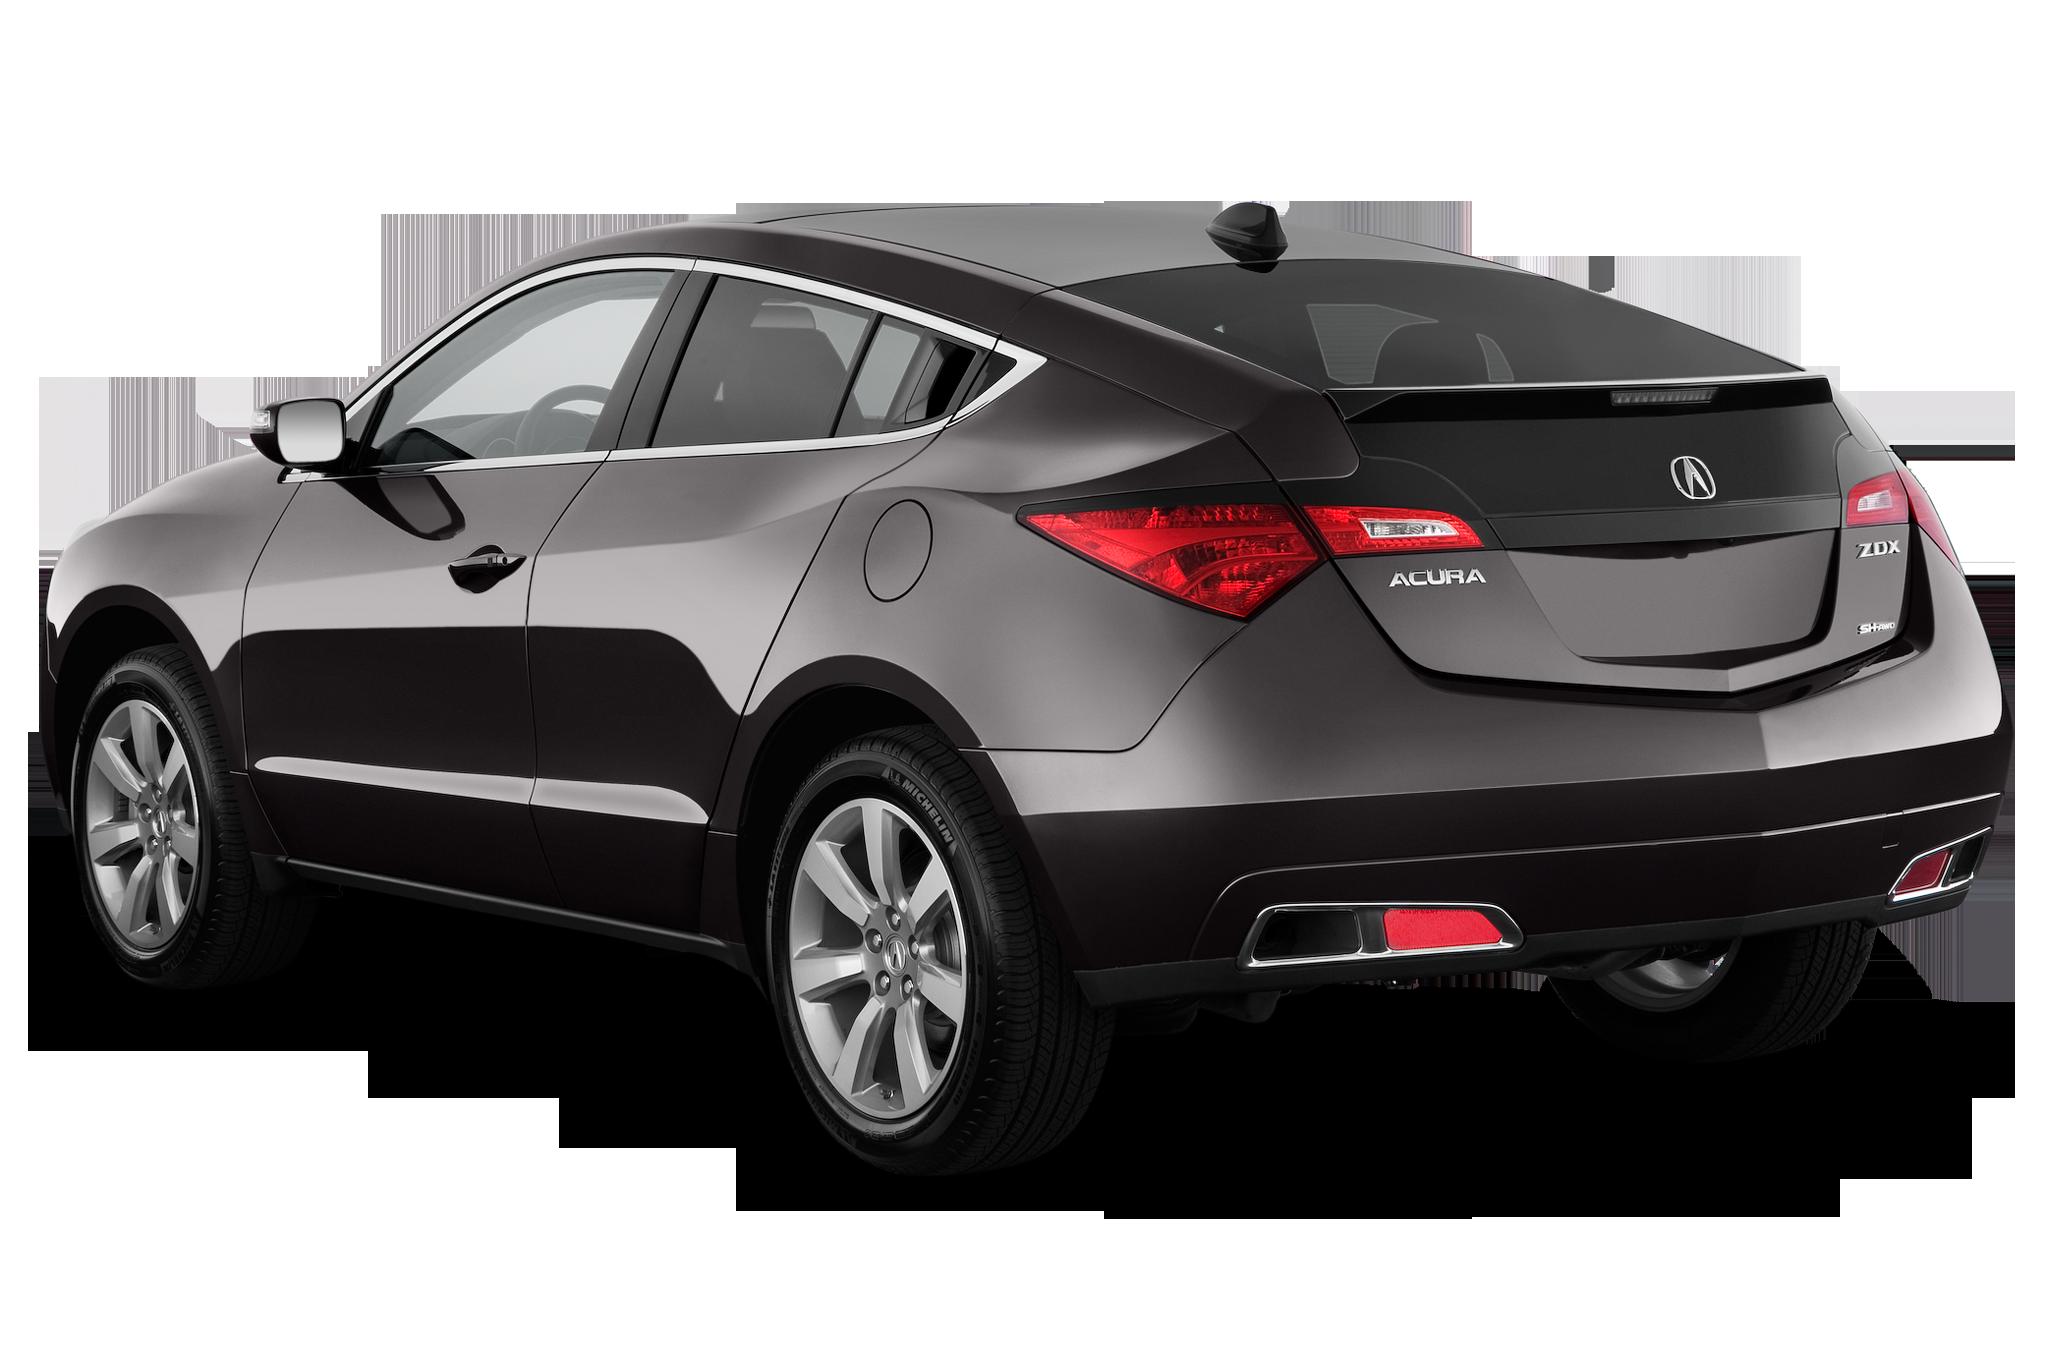 2014 Acura Tl Photos And Price | Autos Post